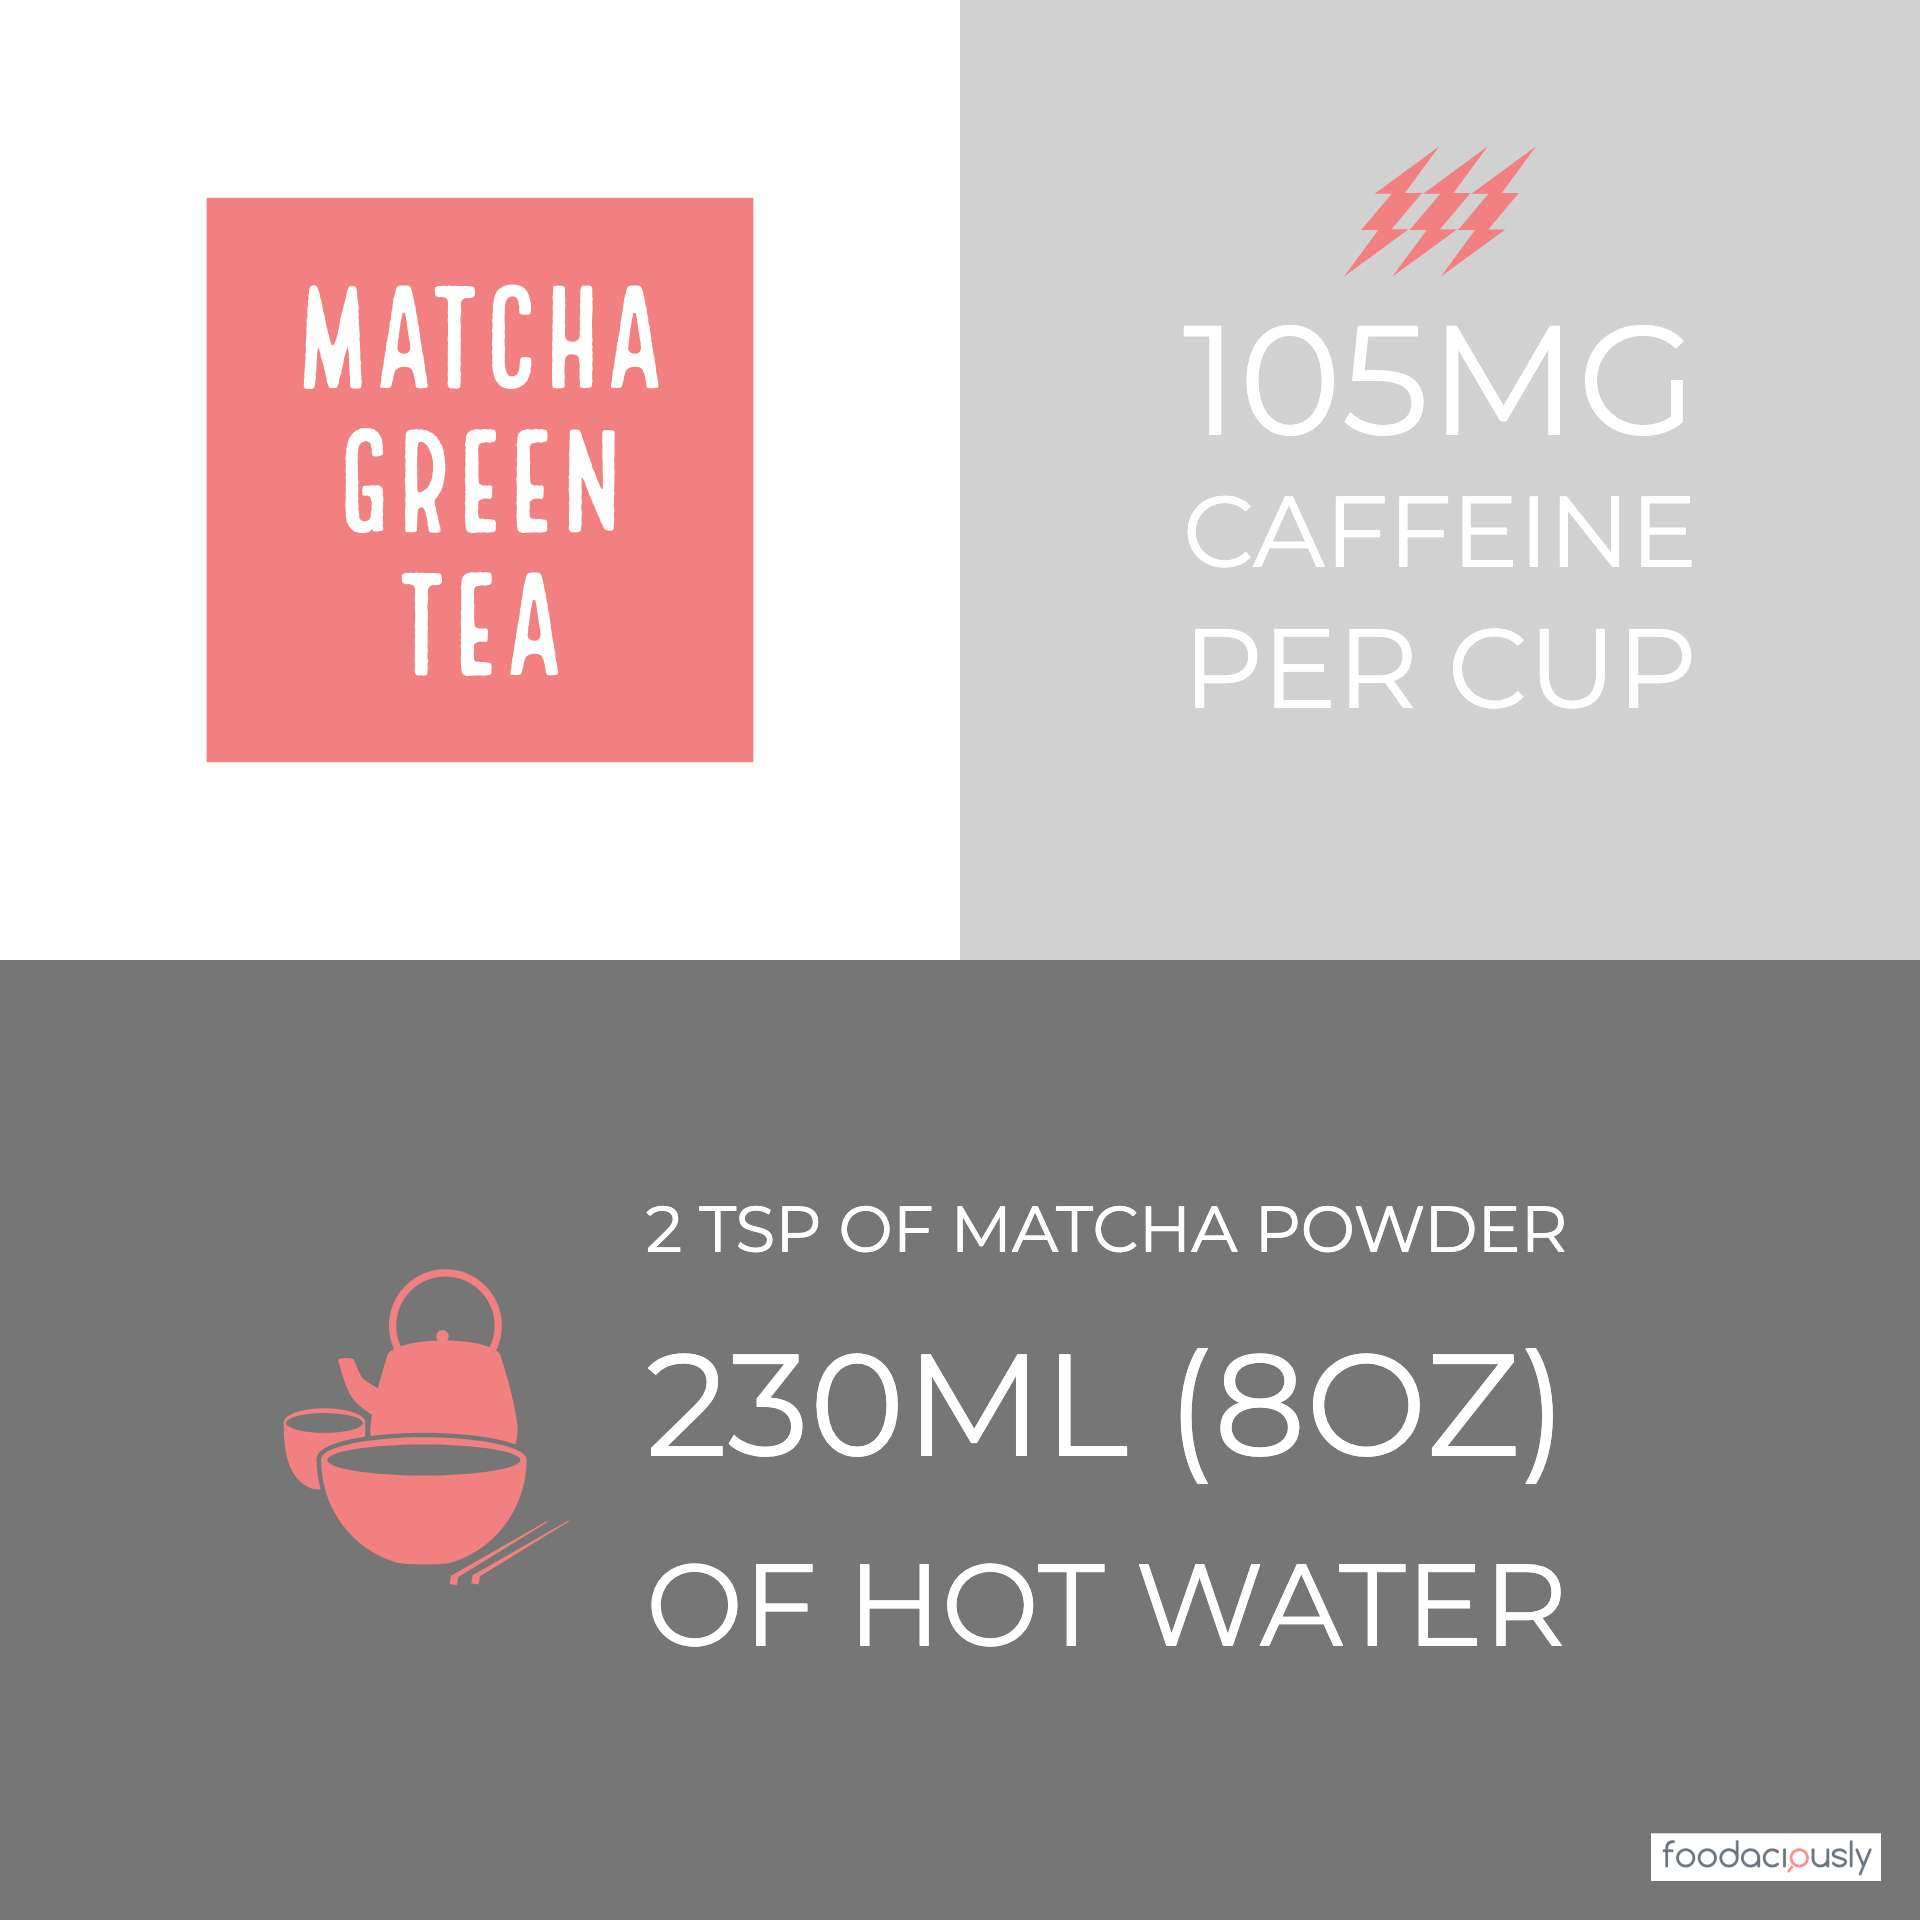 What's Matcha Green Tea